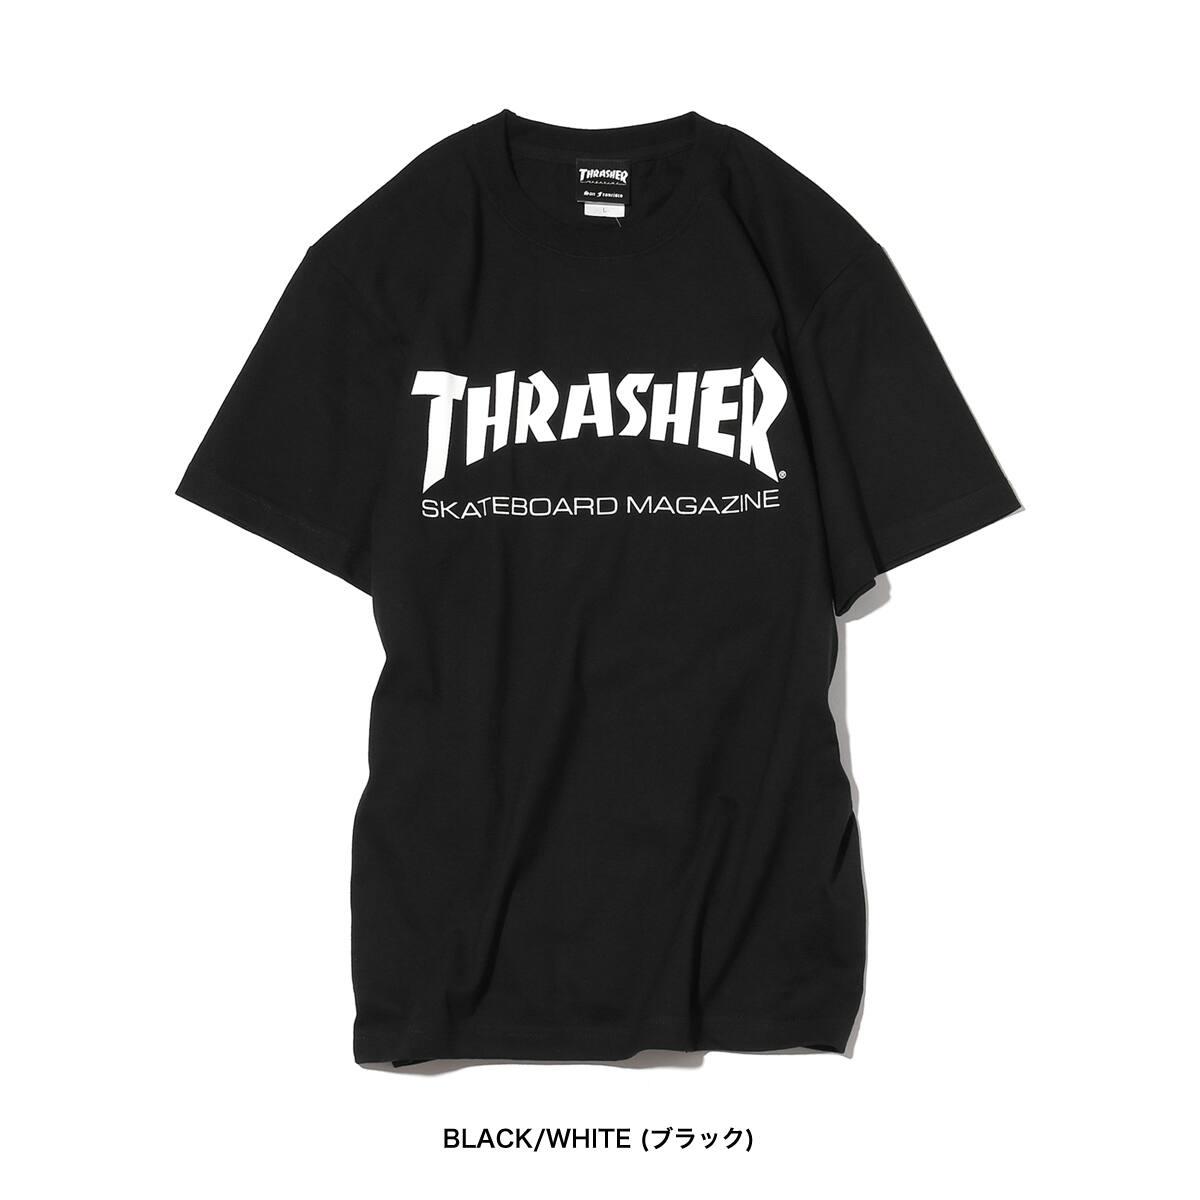 """THRASHER MAG LOGO T-SHIRTWHITE/BLACK/RED 18FW-I""_photo_3"